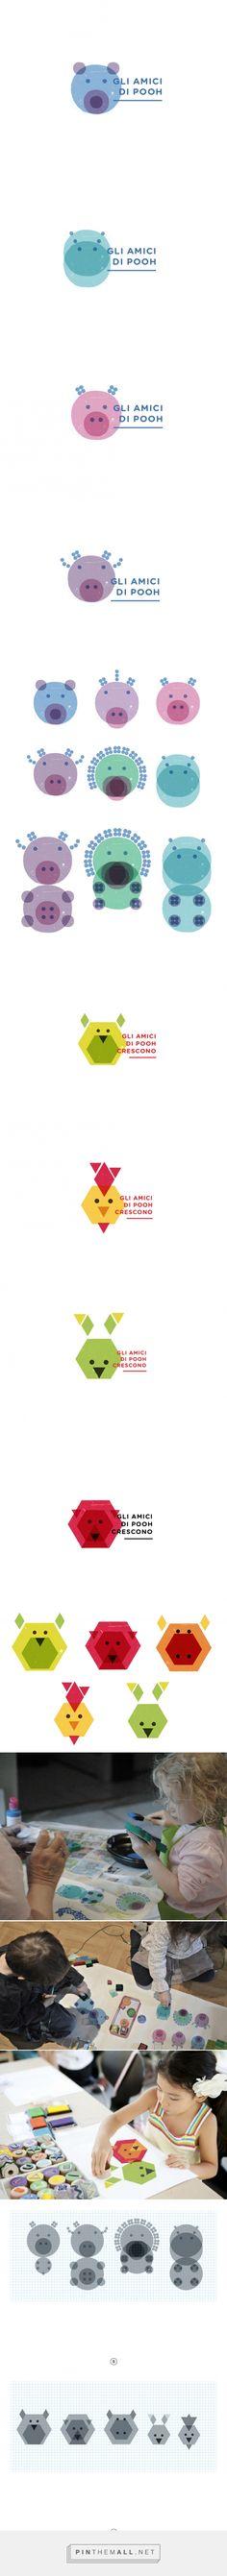 Nursery School Brand Identity on Behance - created via https://pinthemall.net